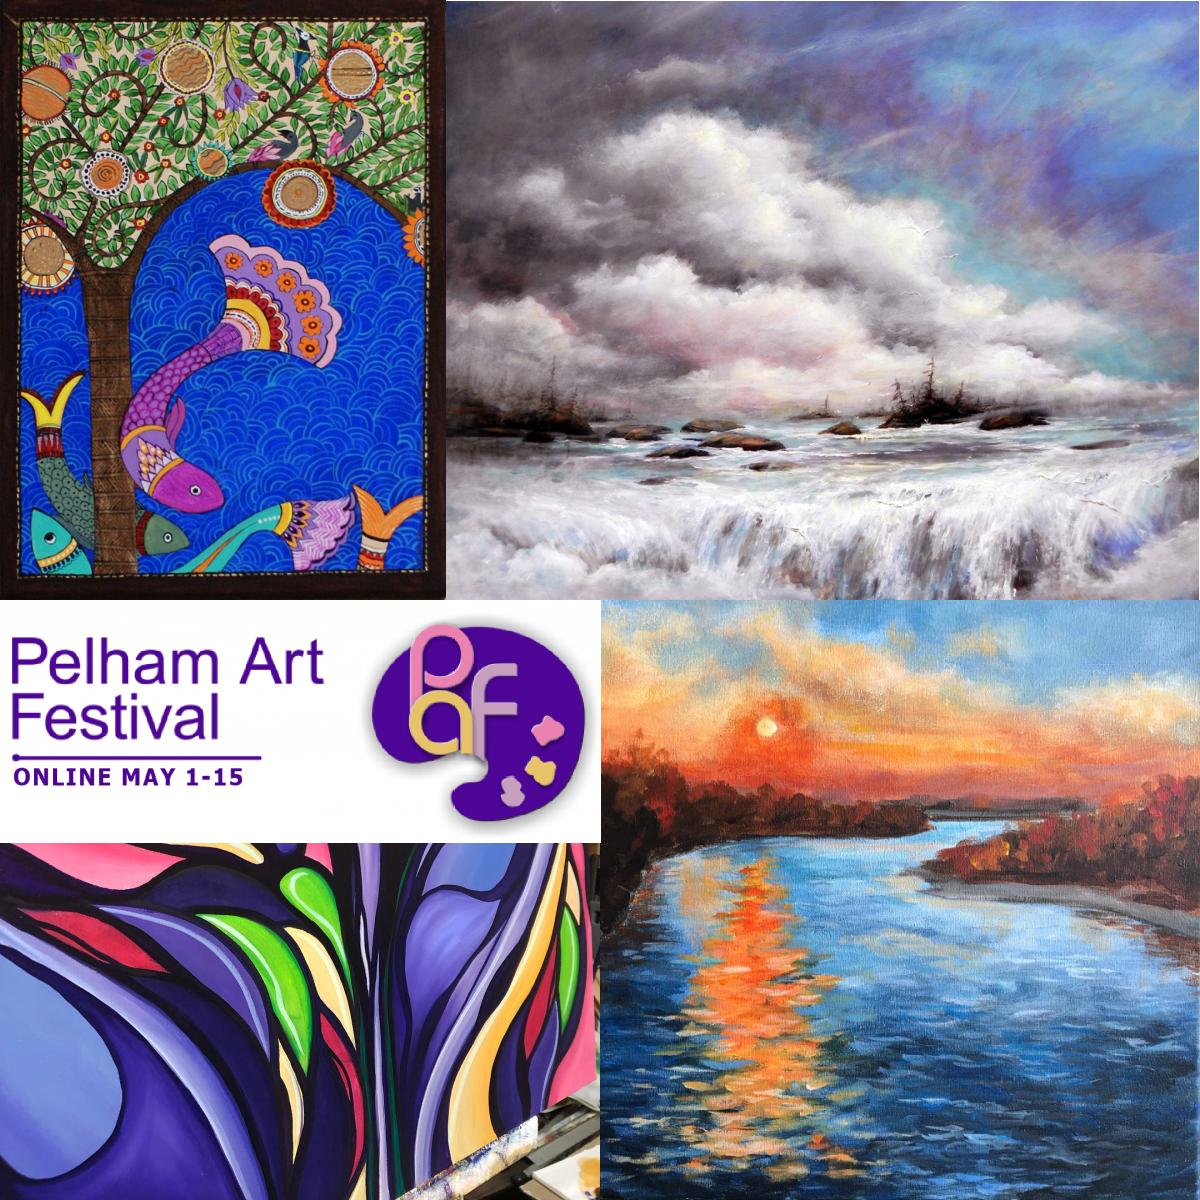 Coming Soon! Pelham Art Festival ONLINE Show & Sale May 1-15, 2021